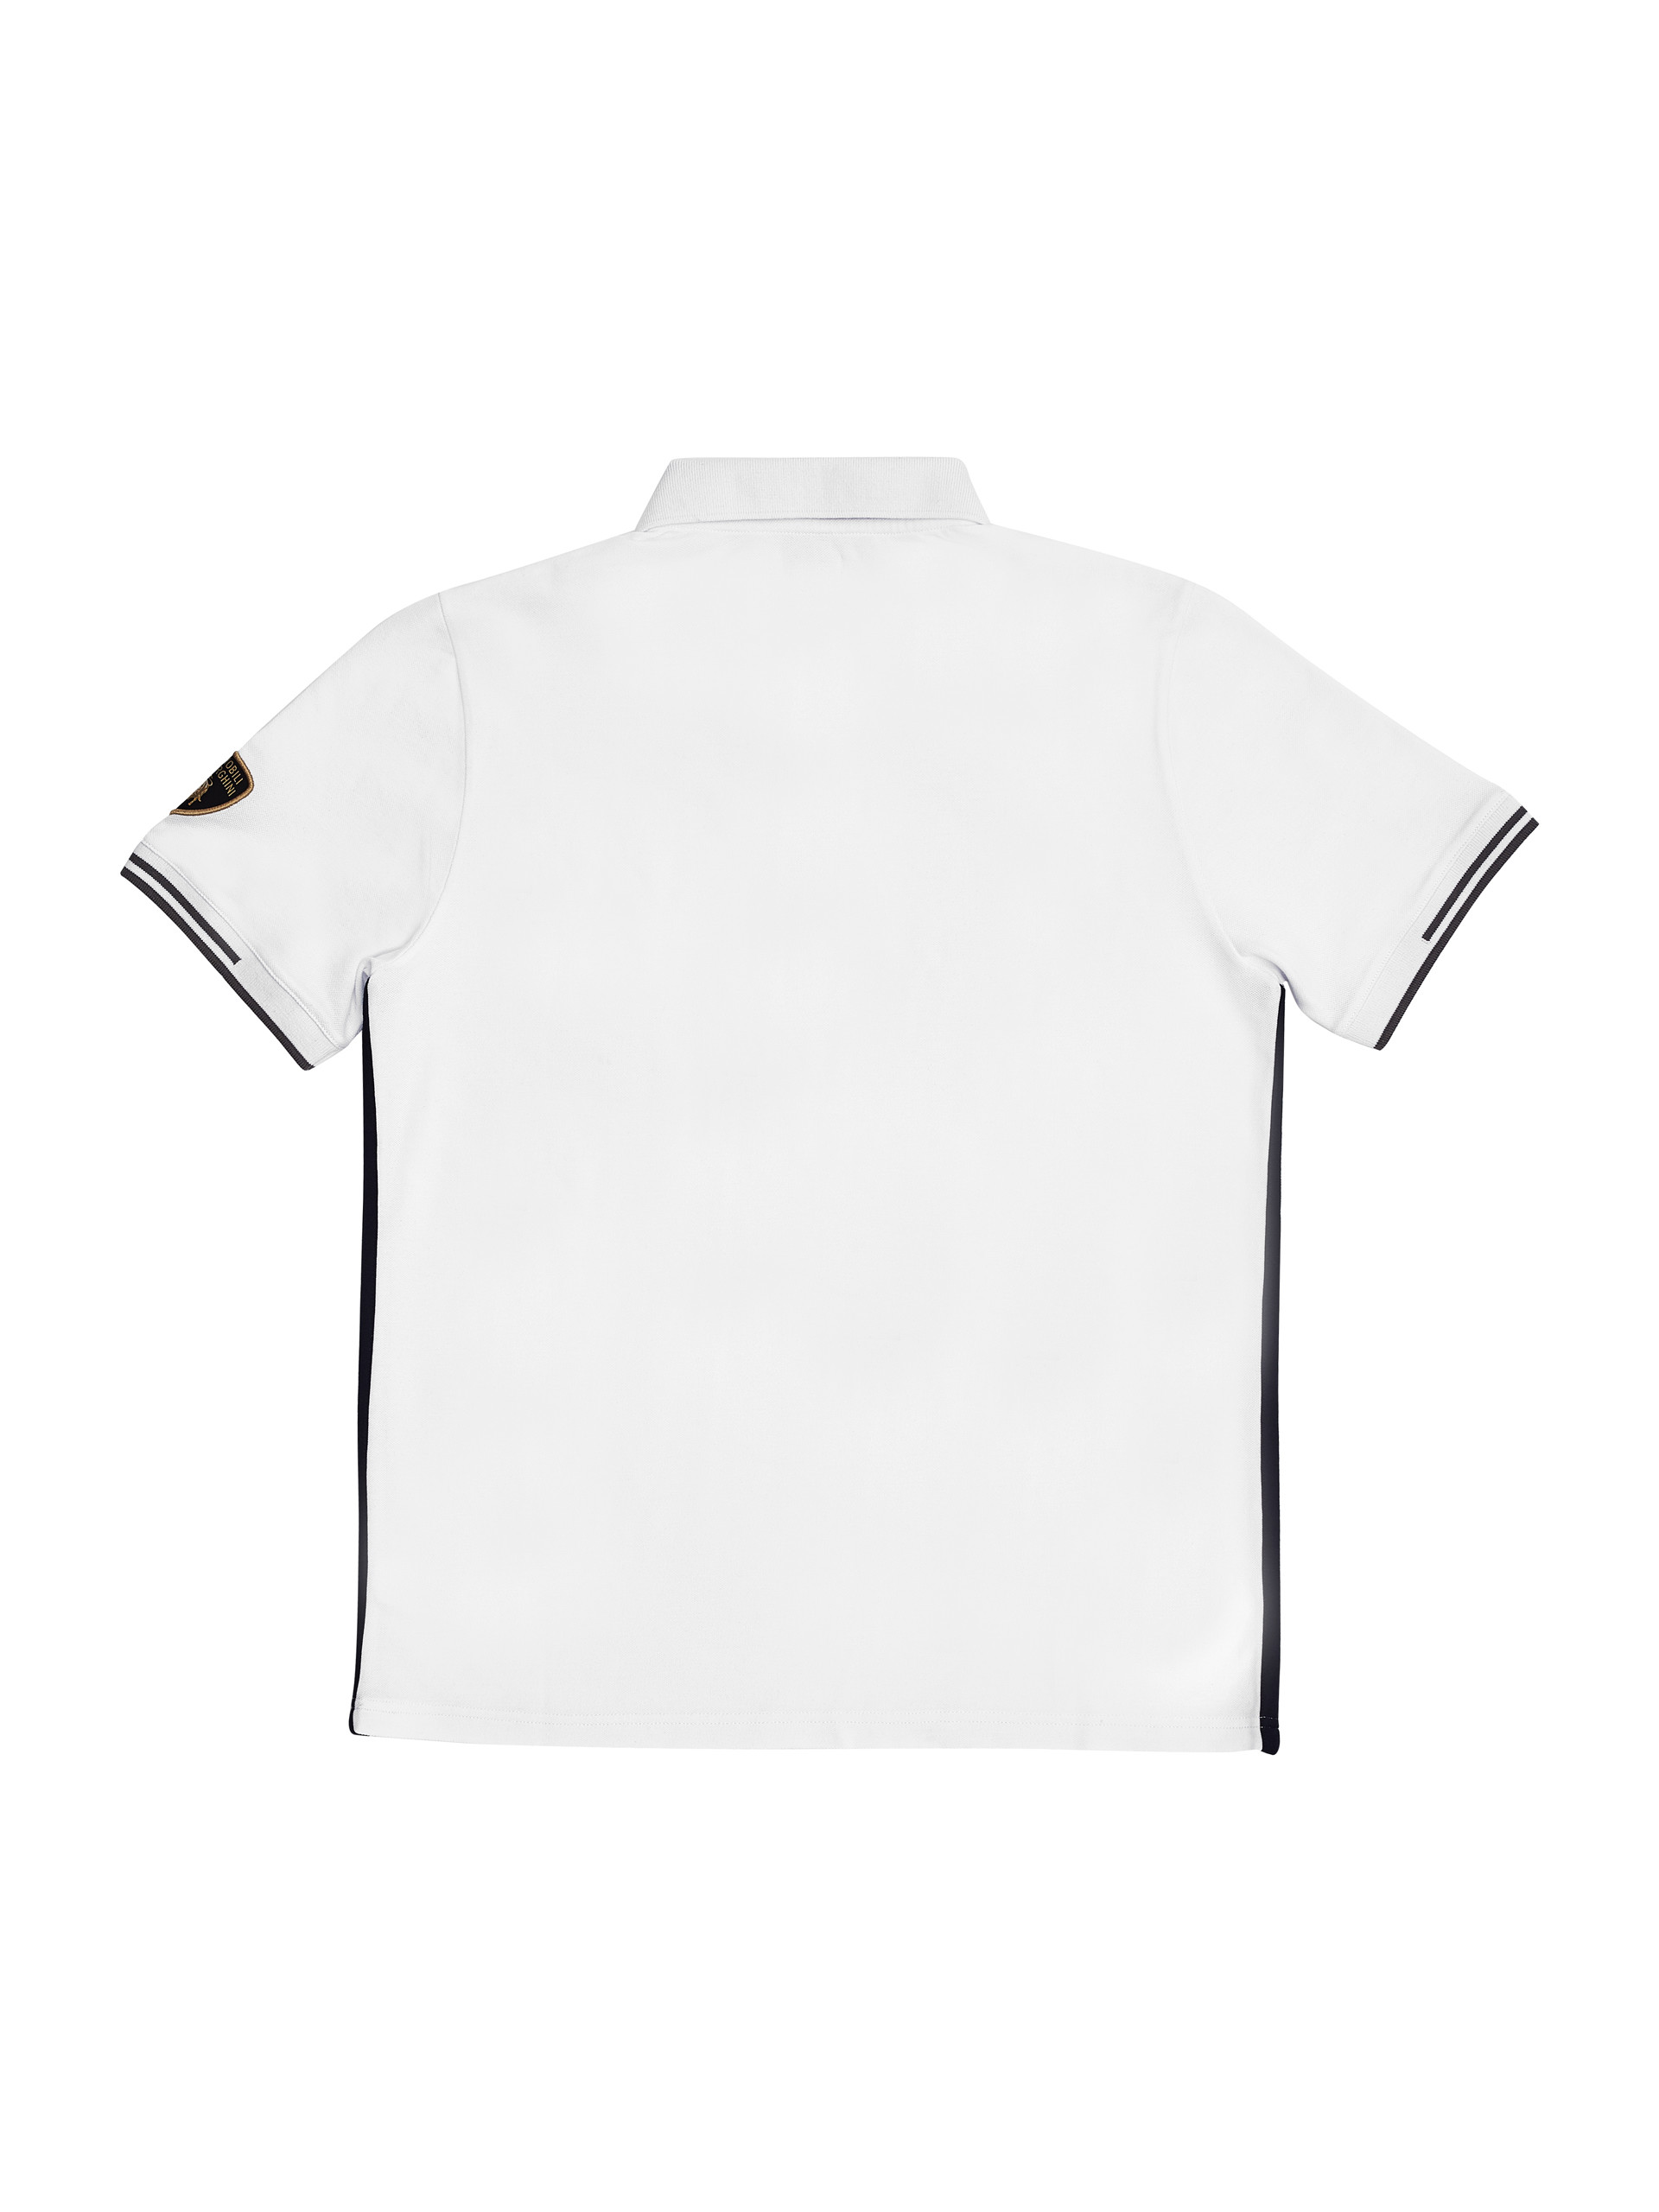 1920x2560 Lamborghini Miura Polo Shirt, Cod. 9446 Lamborghini Store